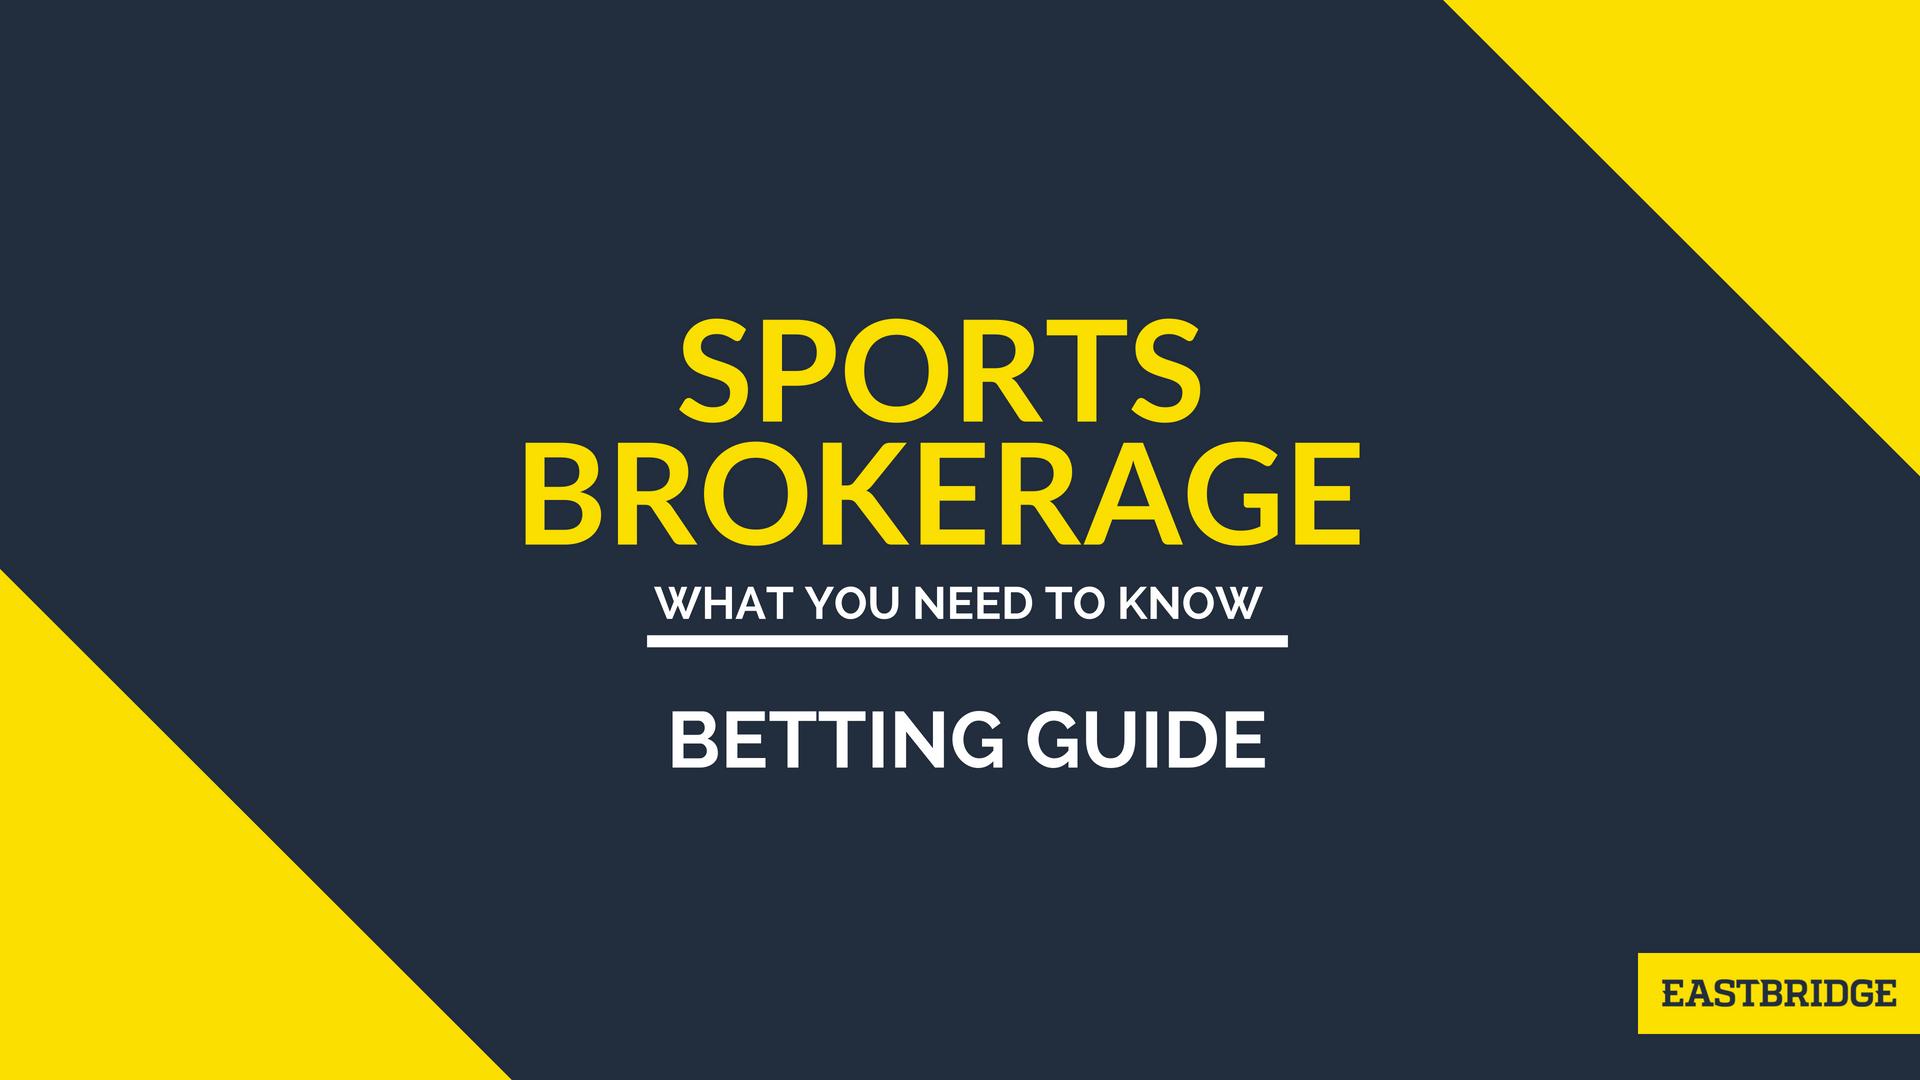 Sports Brokerage